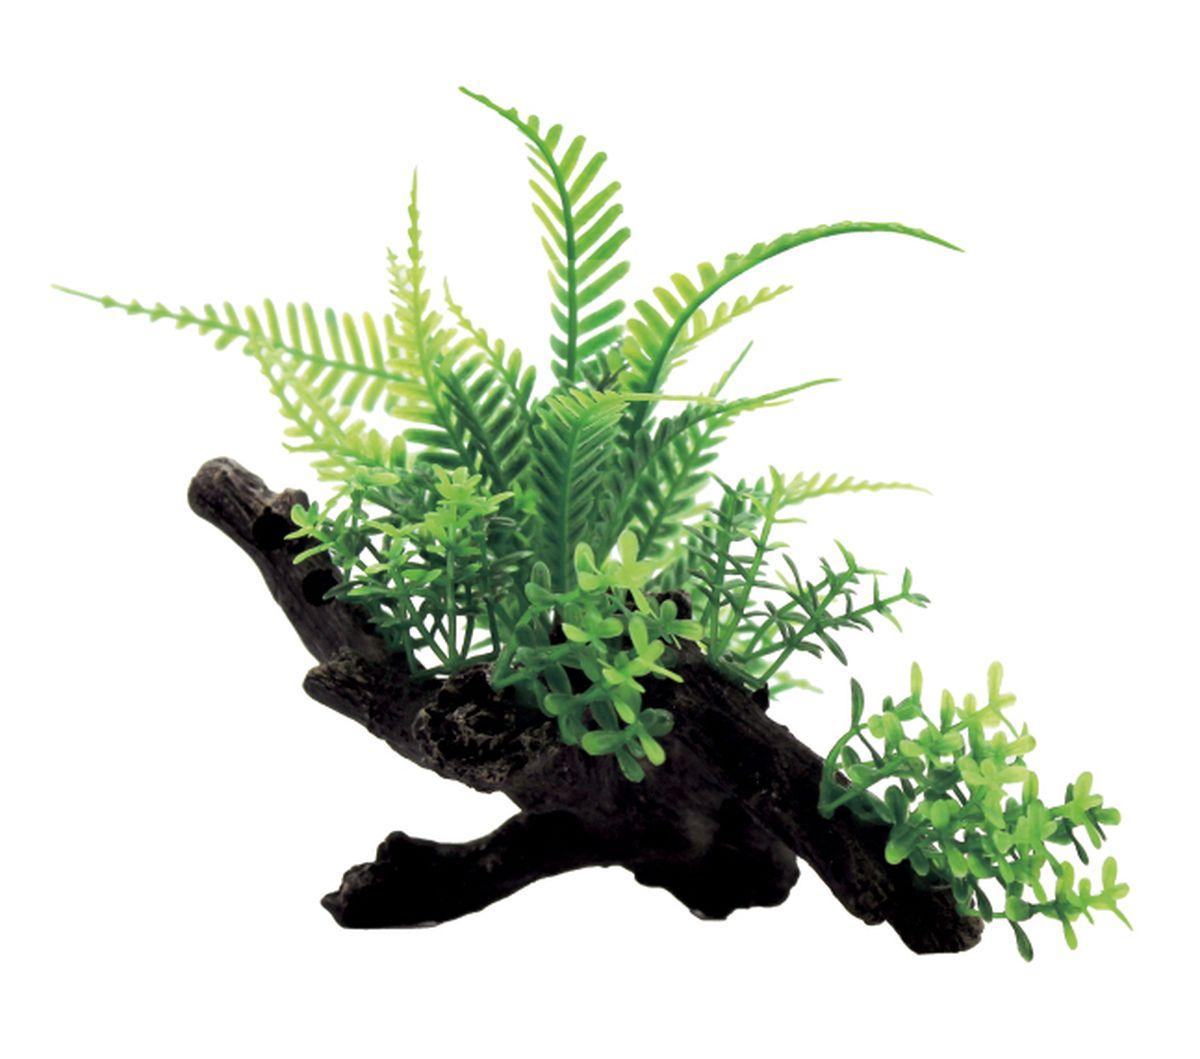 Композиция из растений для аквариума ArtUniq Папоротник на коряге, 20 x 12 x 12 см0120710Композиция из растений для аквариума ArtUniq Папоротник на коряге, 20 x 12 x 12 см